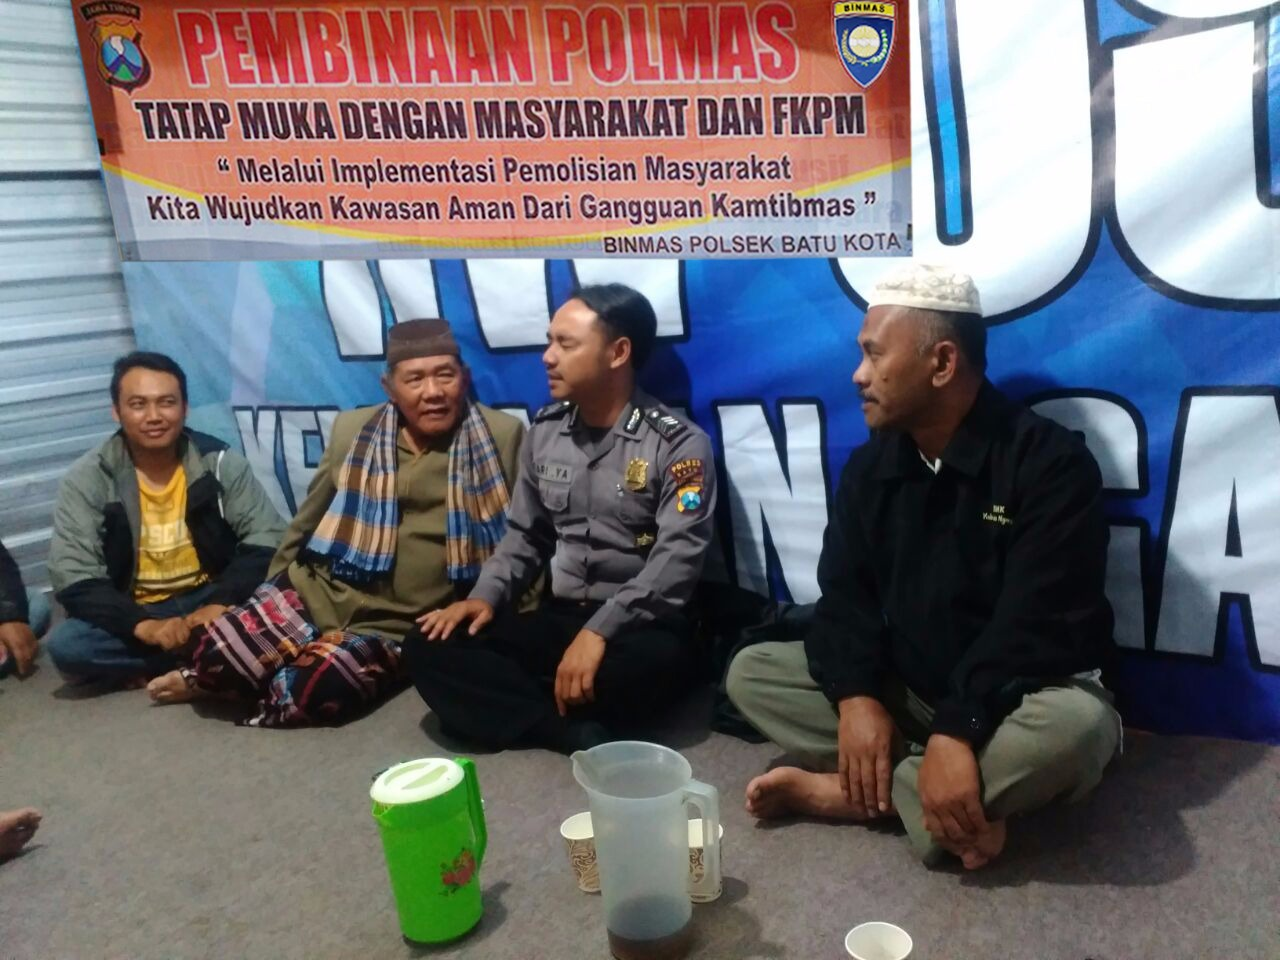 Pembinaan Polmas Bhabin Kel. Ngaglik Polres Batu Kota Polres Batu Lakukan Tatap Muka Kepada Masyarakat dan FKPM